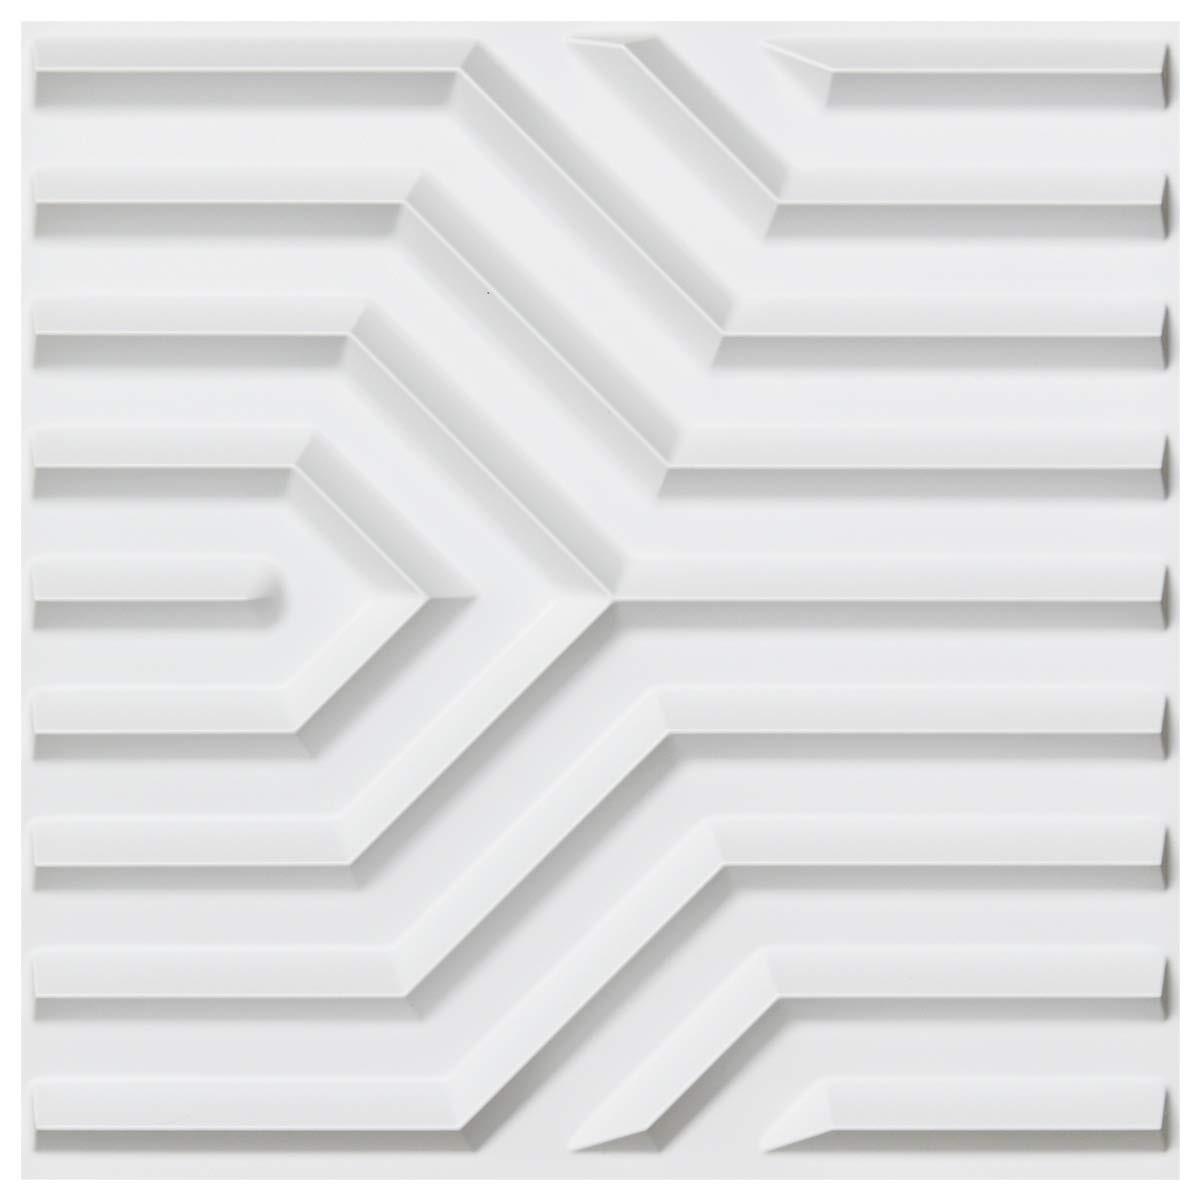 50x50 سنتيمتر ثلاثية الأبعاد لوحات الحائط البلاستيكية هندسية ماتي نمط حزمة من 12 البلاط لغرفة النوم المعيشة ديكور جدار الغرف